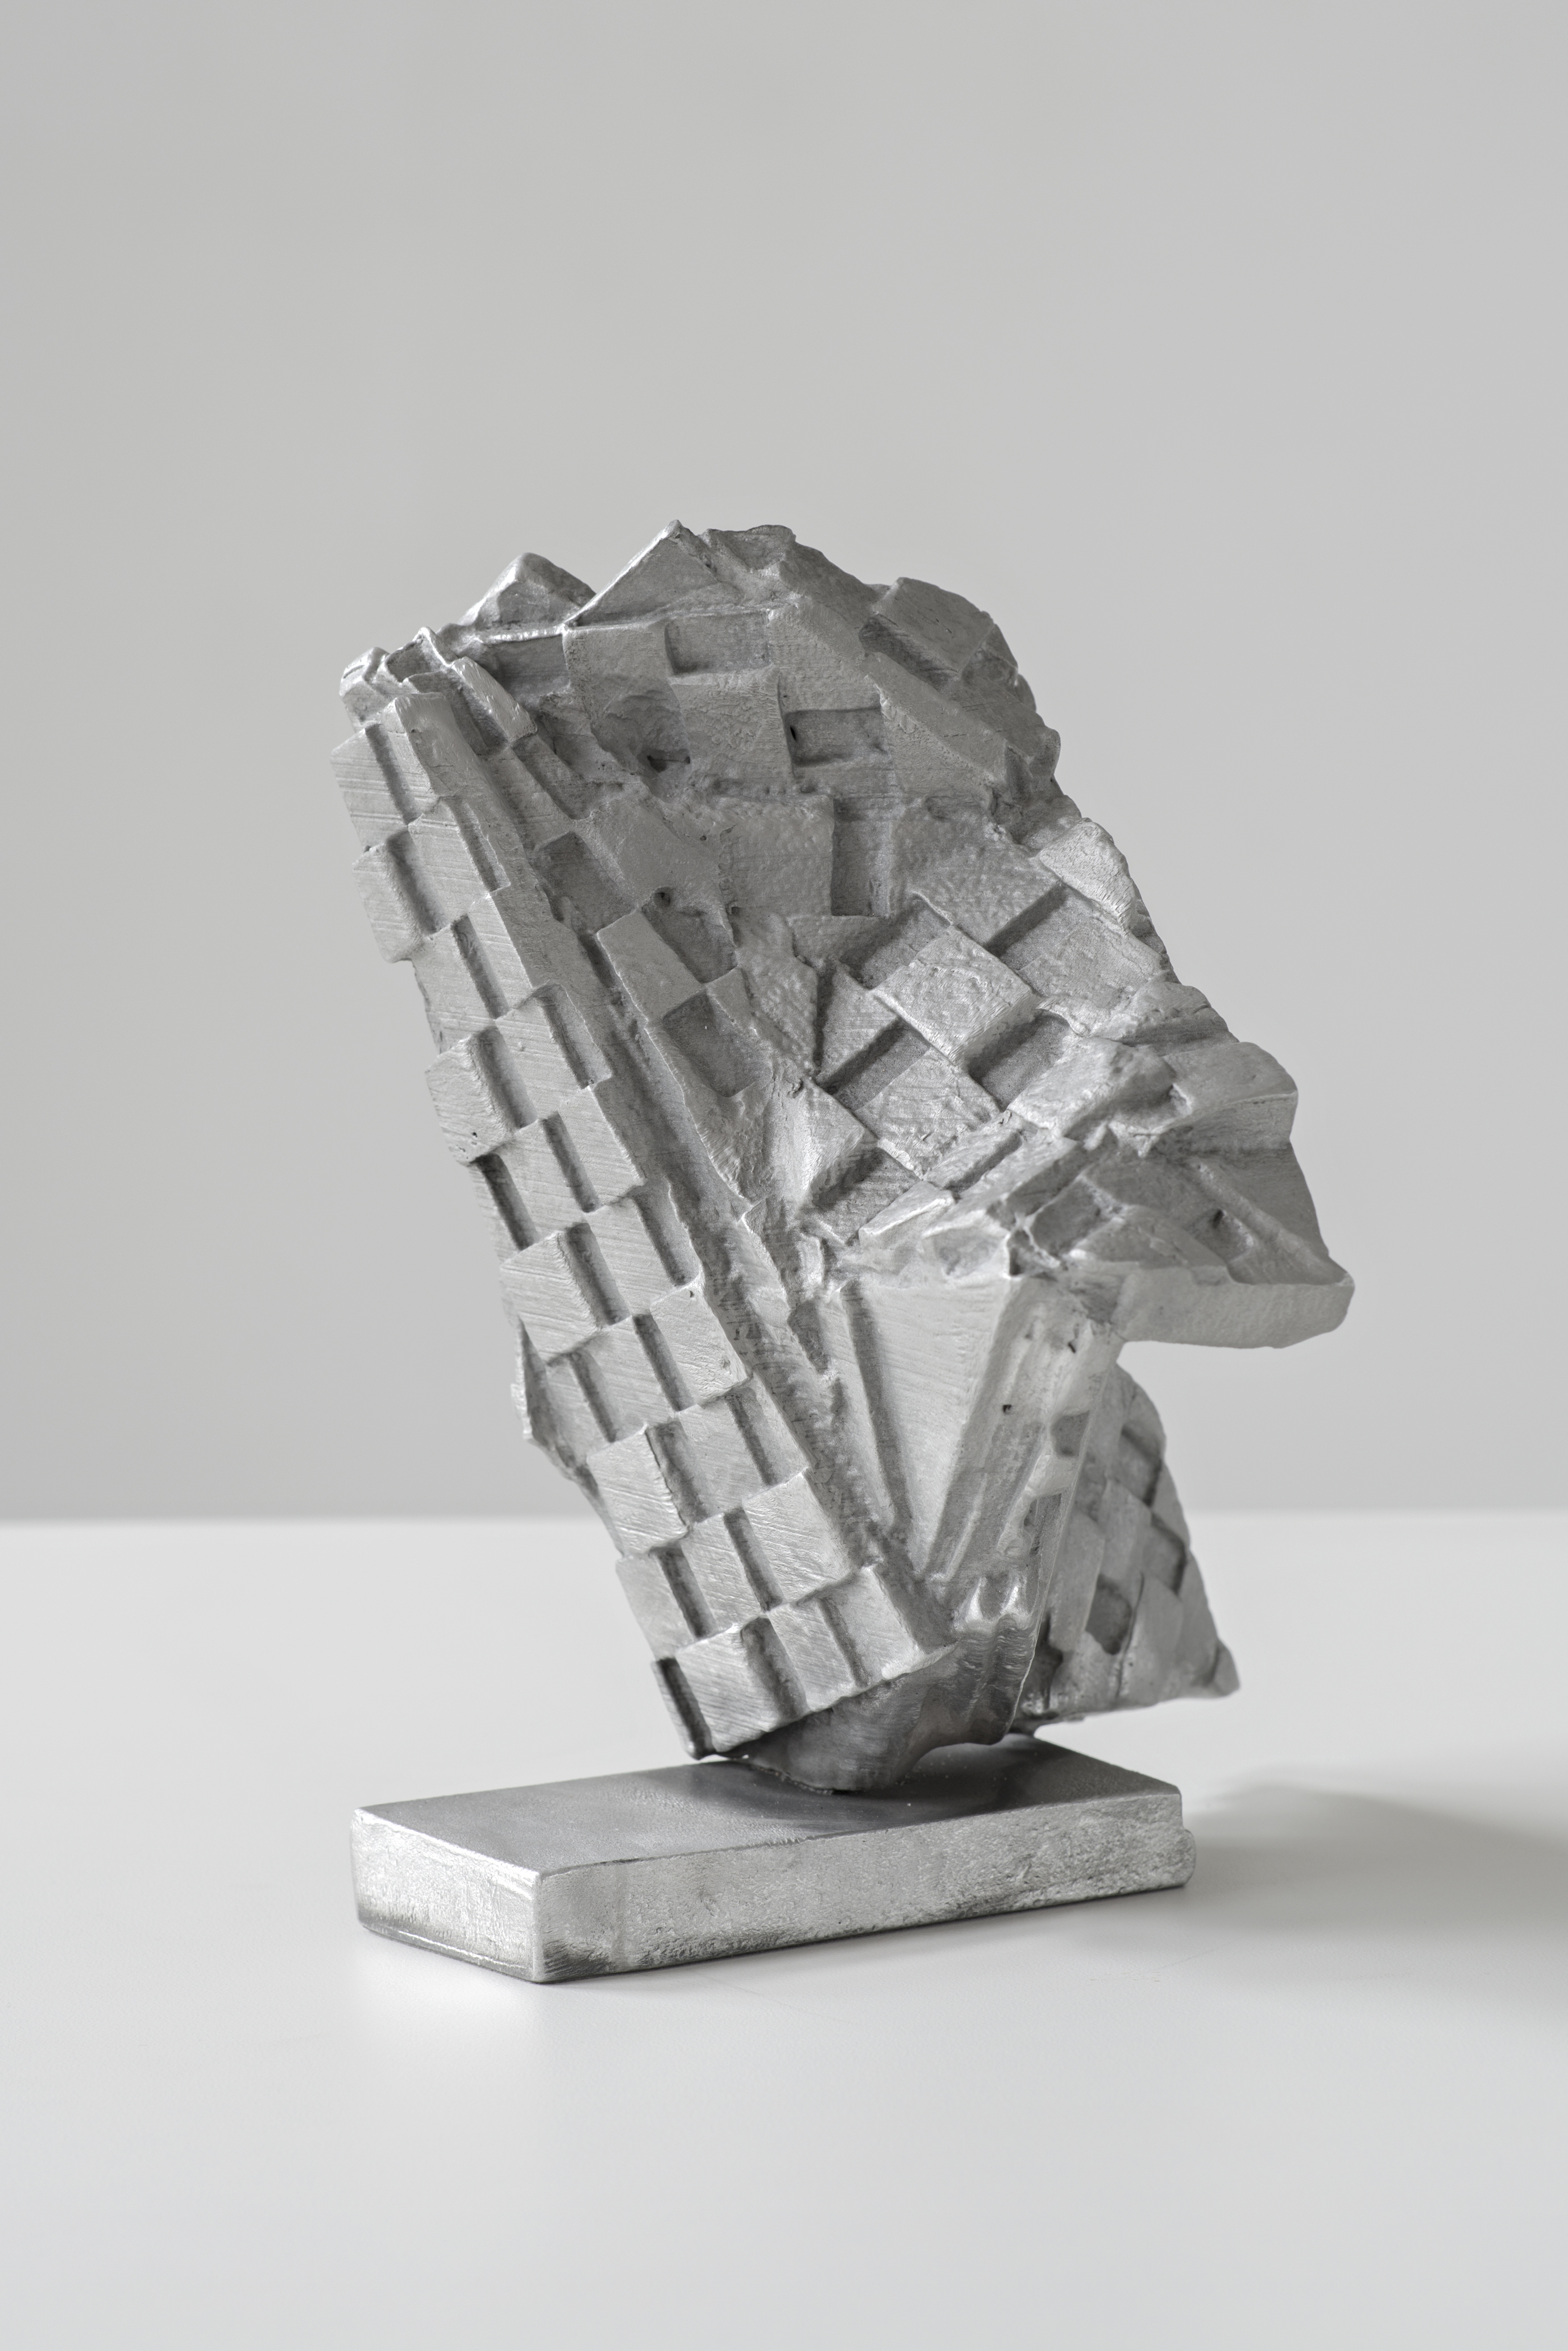 <i>Berliner Kindheit (edition) 1/5</i>, 2020<br />cast aluminium, 20 x 16 x 15 cm<br />